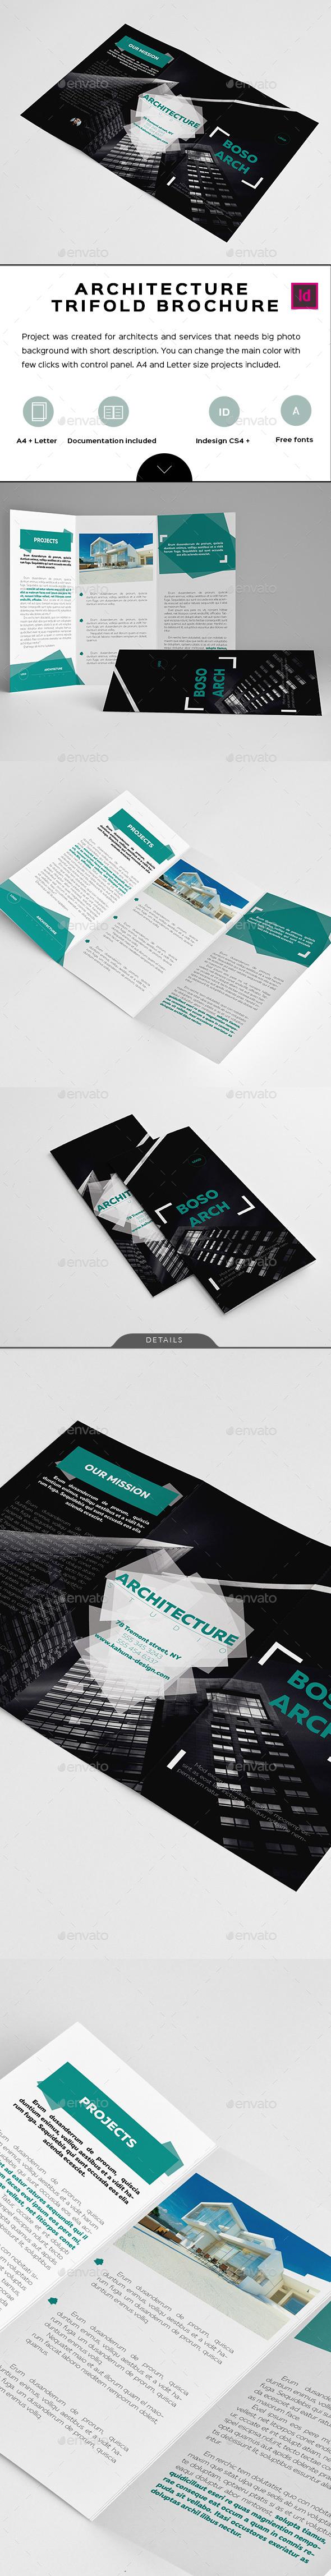 Boso Architecture Trifold Brochure - Brochures Print Templates